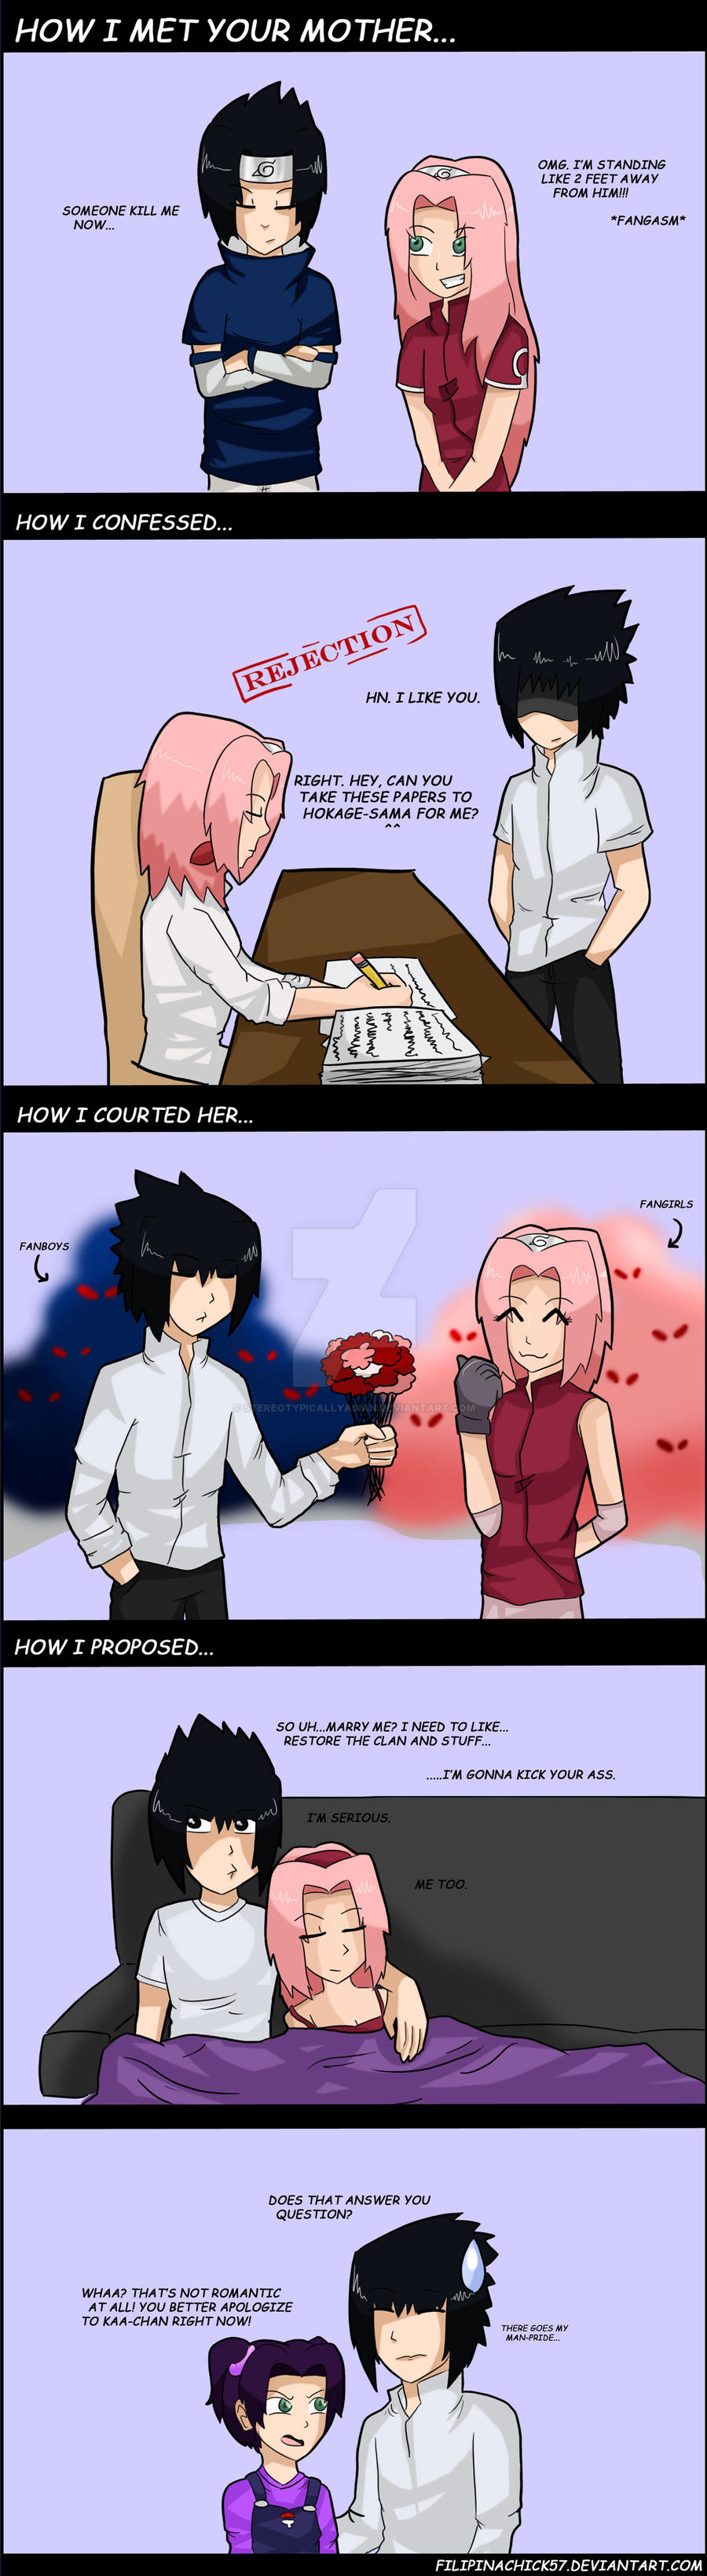 sasusaku funny comic by naruto1213 on DeviantArt